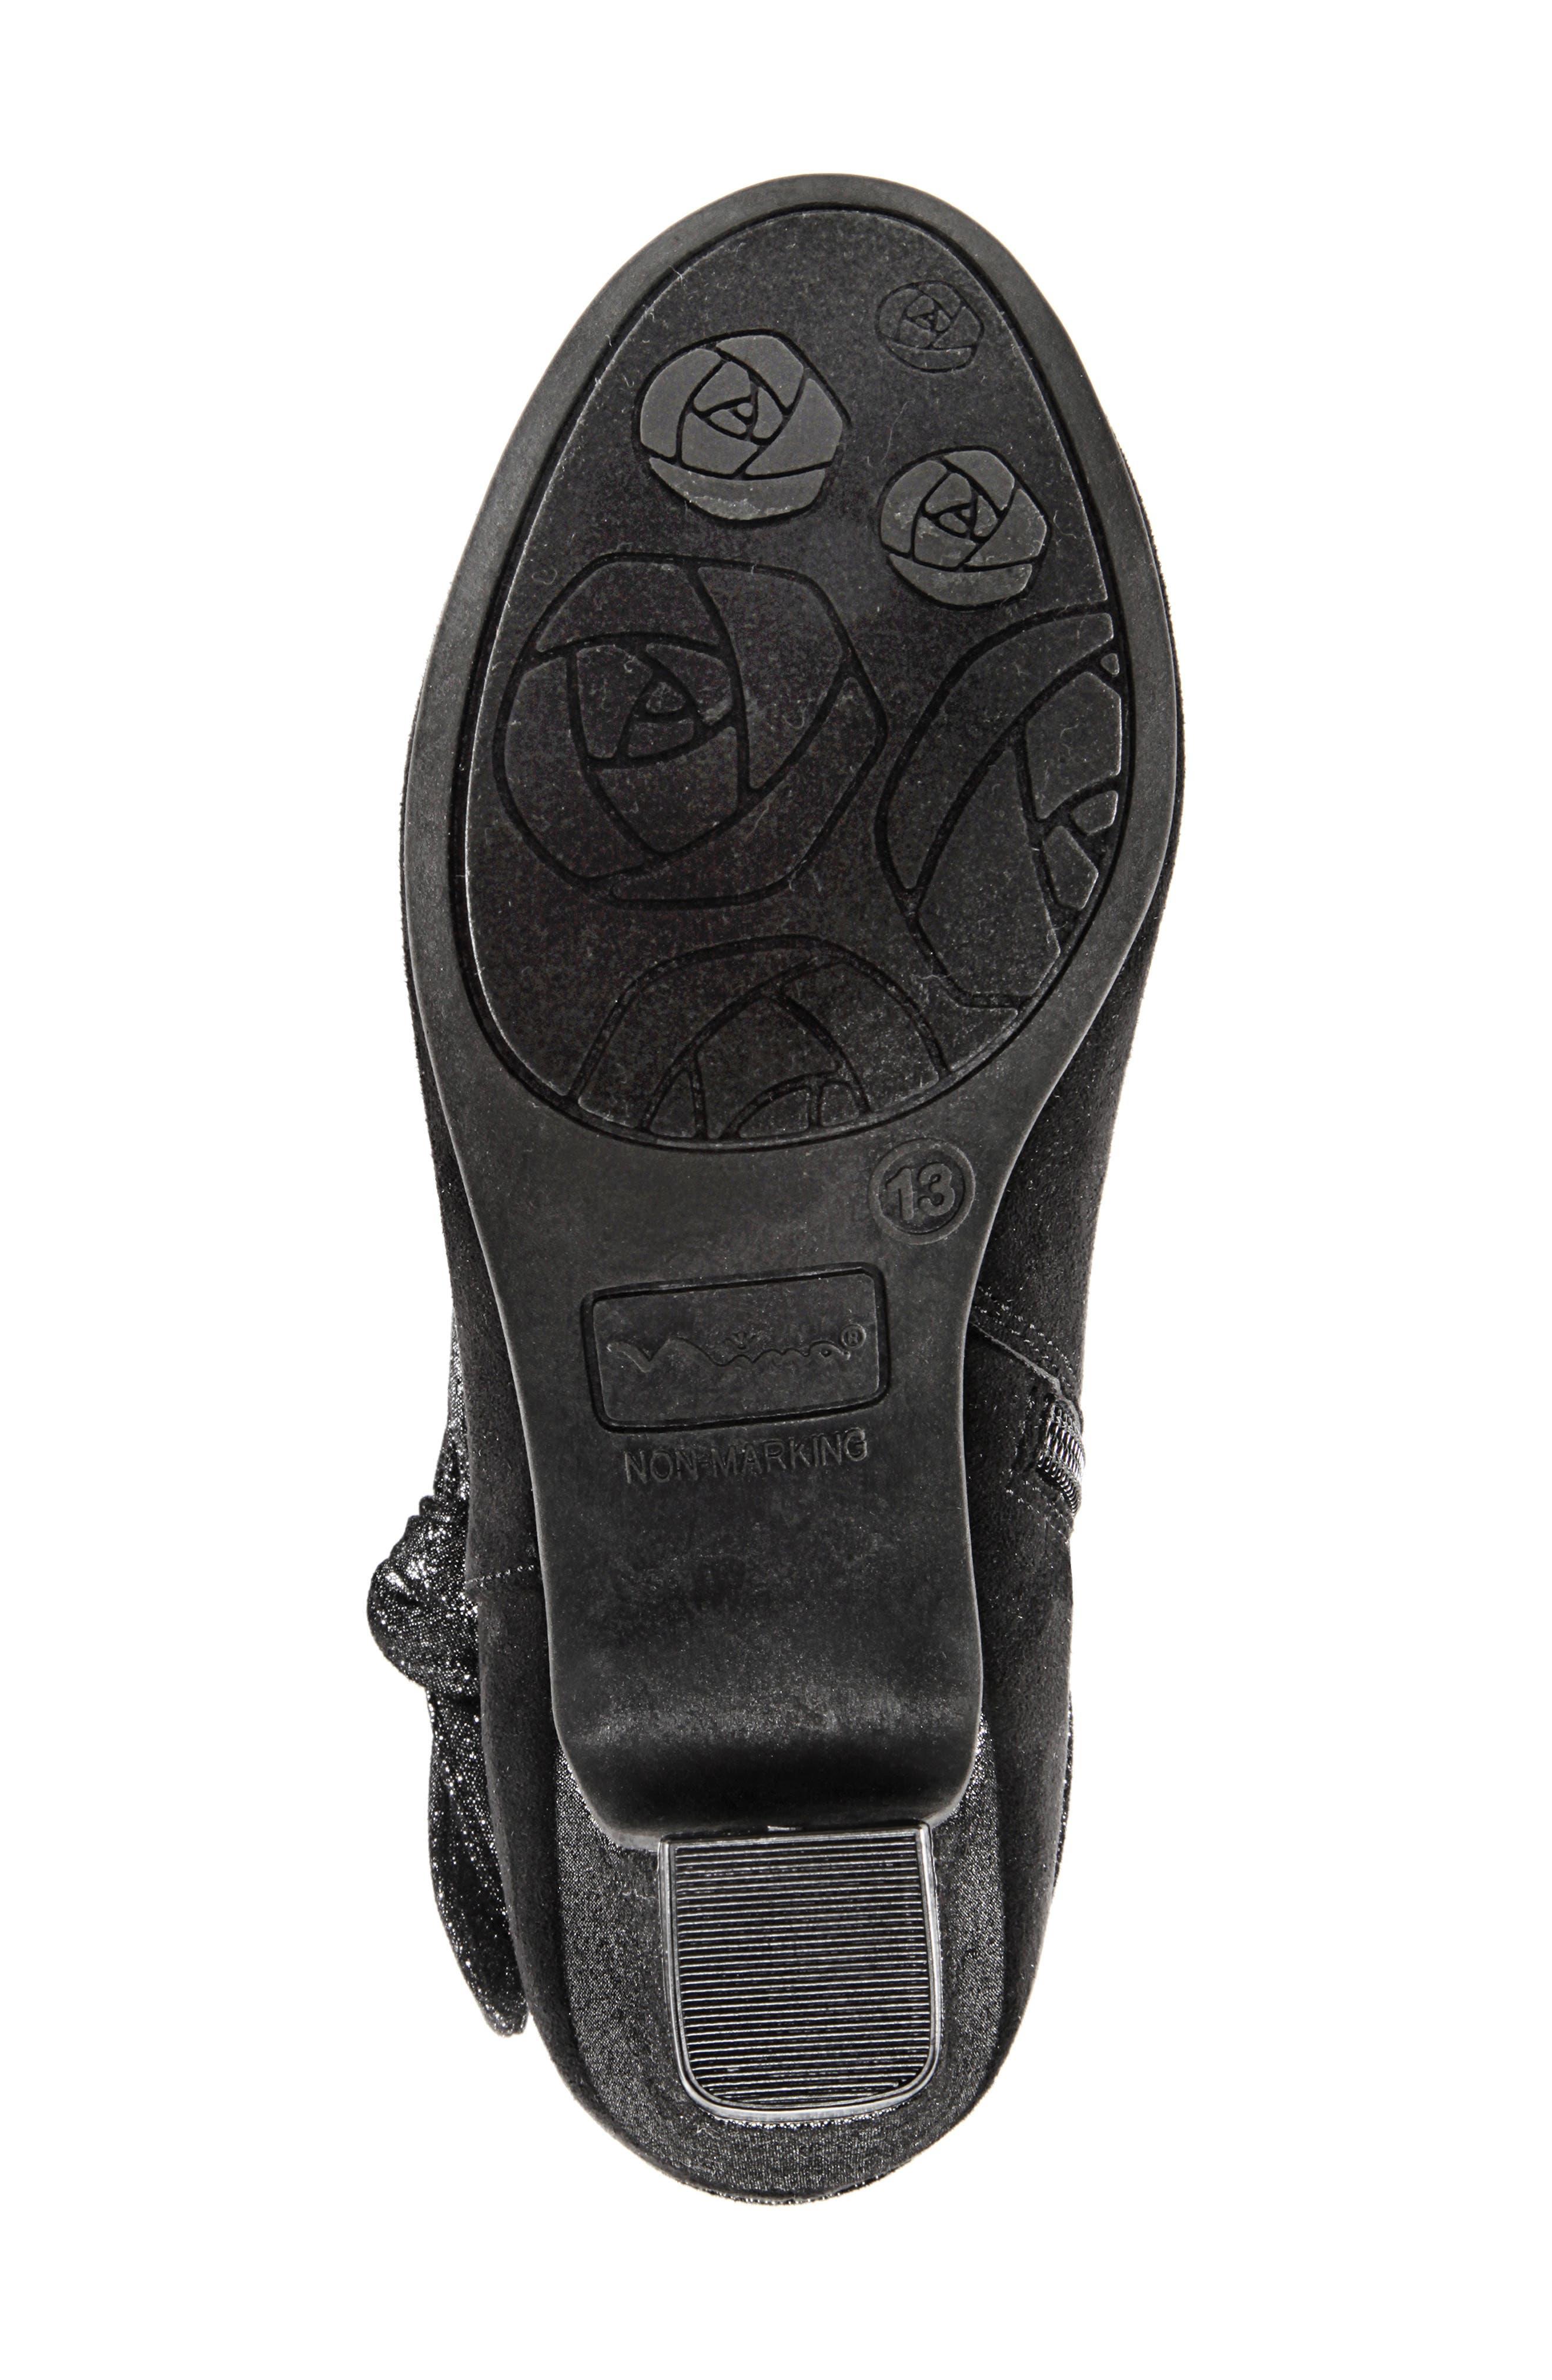 Evelin Block Heel Bootie,                             Alternate thumbnail 12, color,                             BLACK MICRO SUEDE